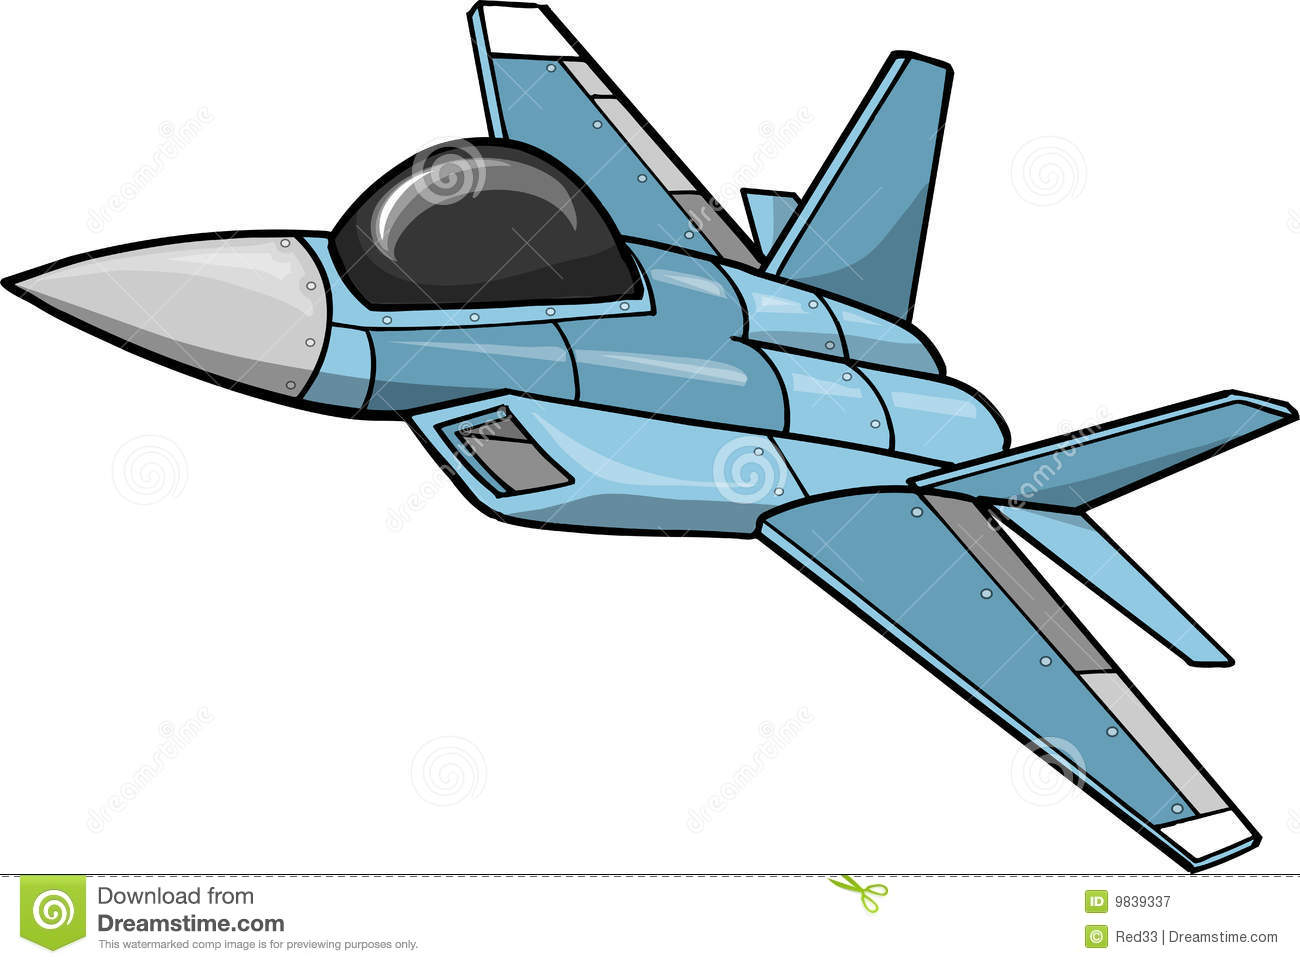 Jet clipart. Free